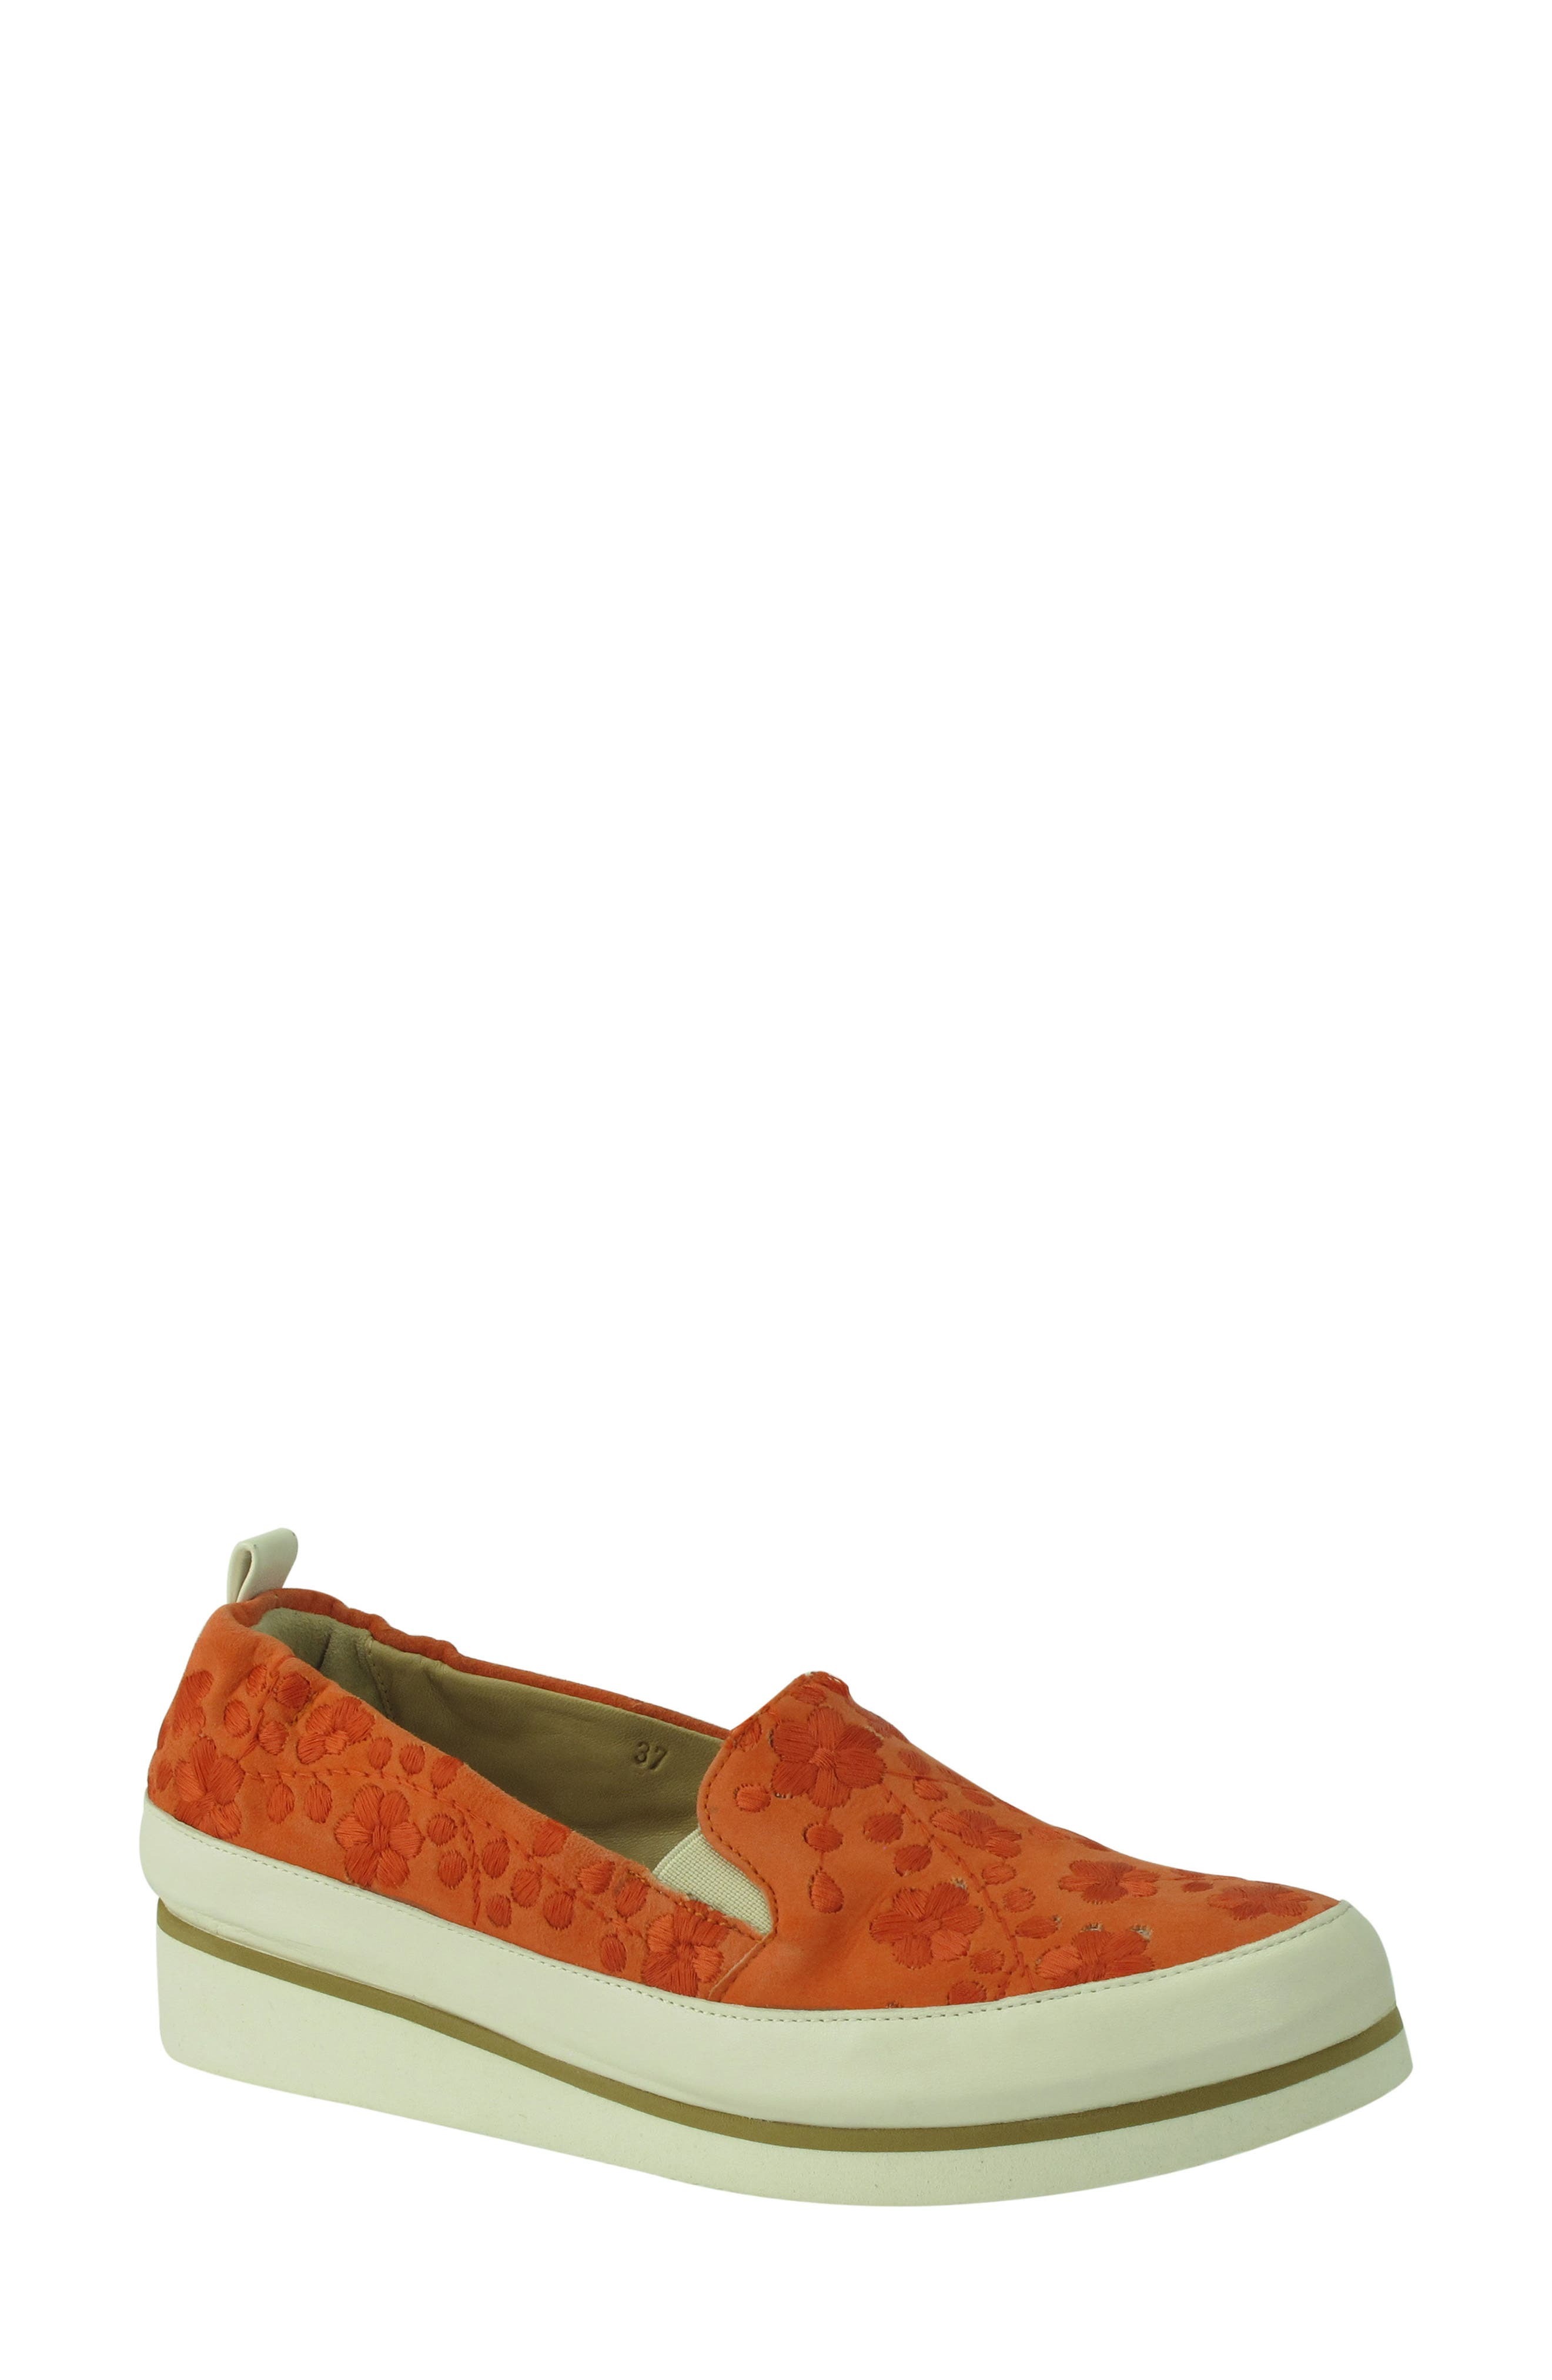 Nell Slip-On Sneaker,                             Main thumbnail 1, color,                             Tangerine Suede